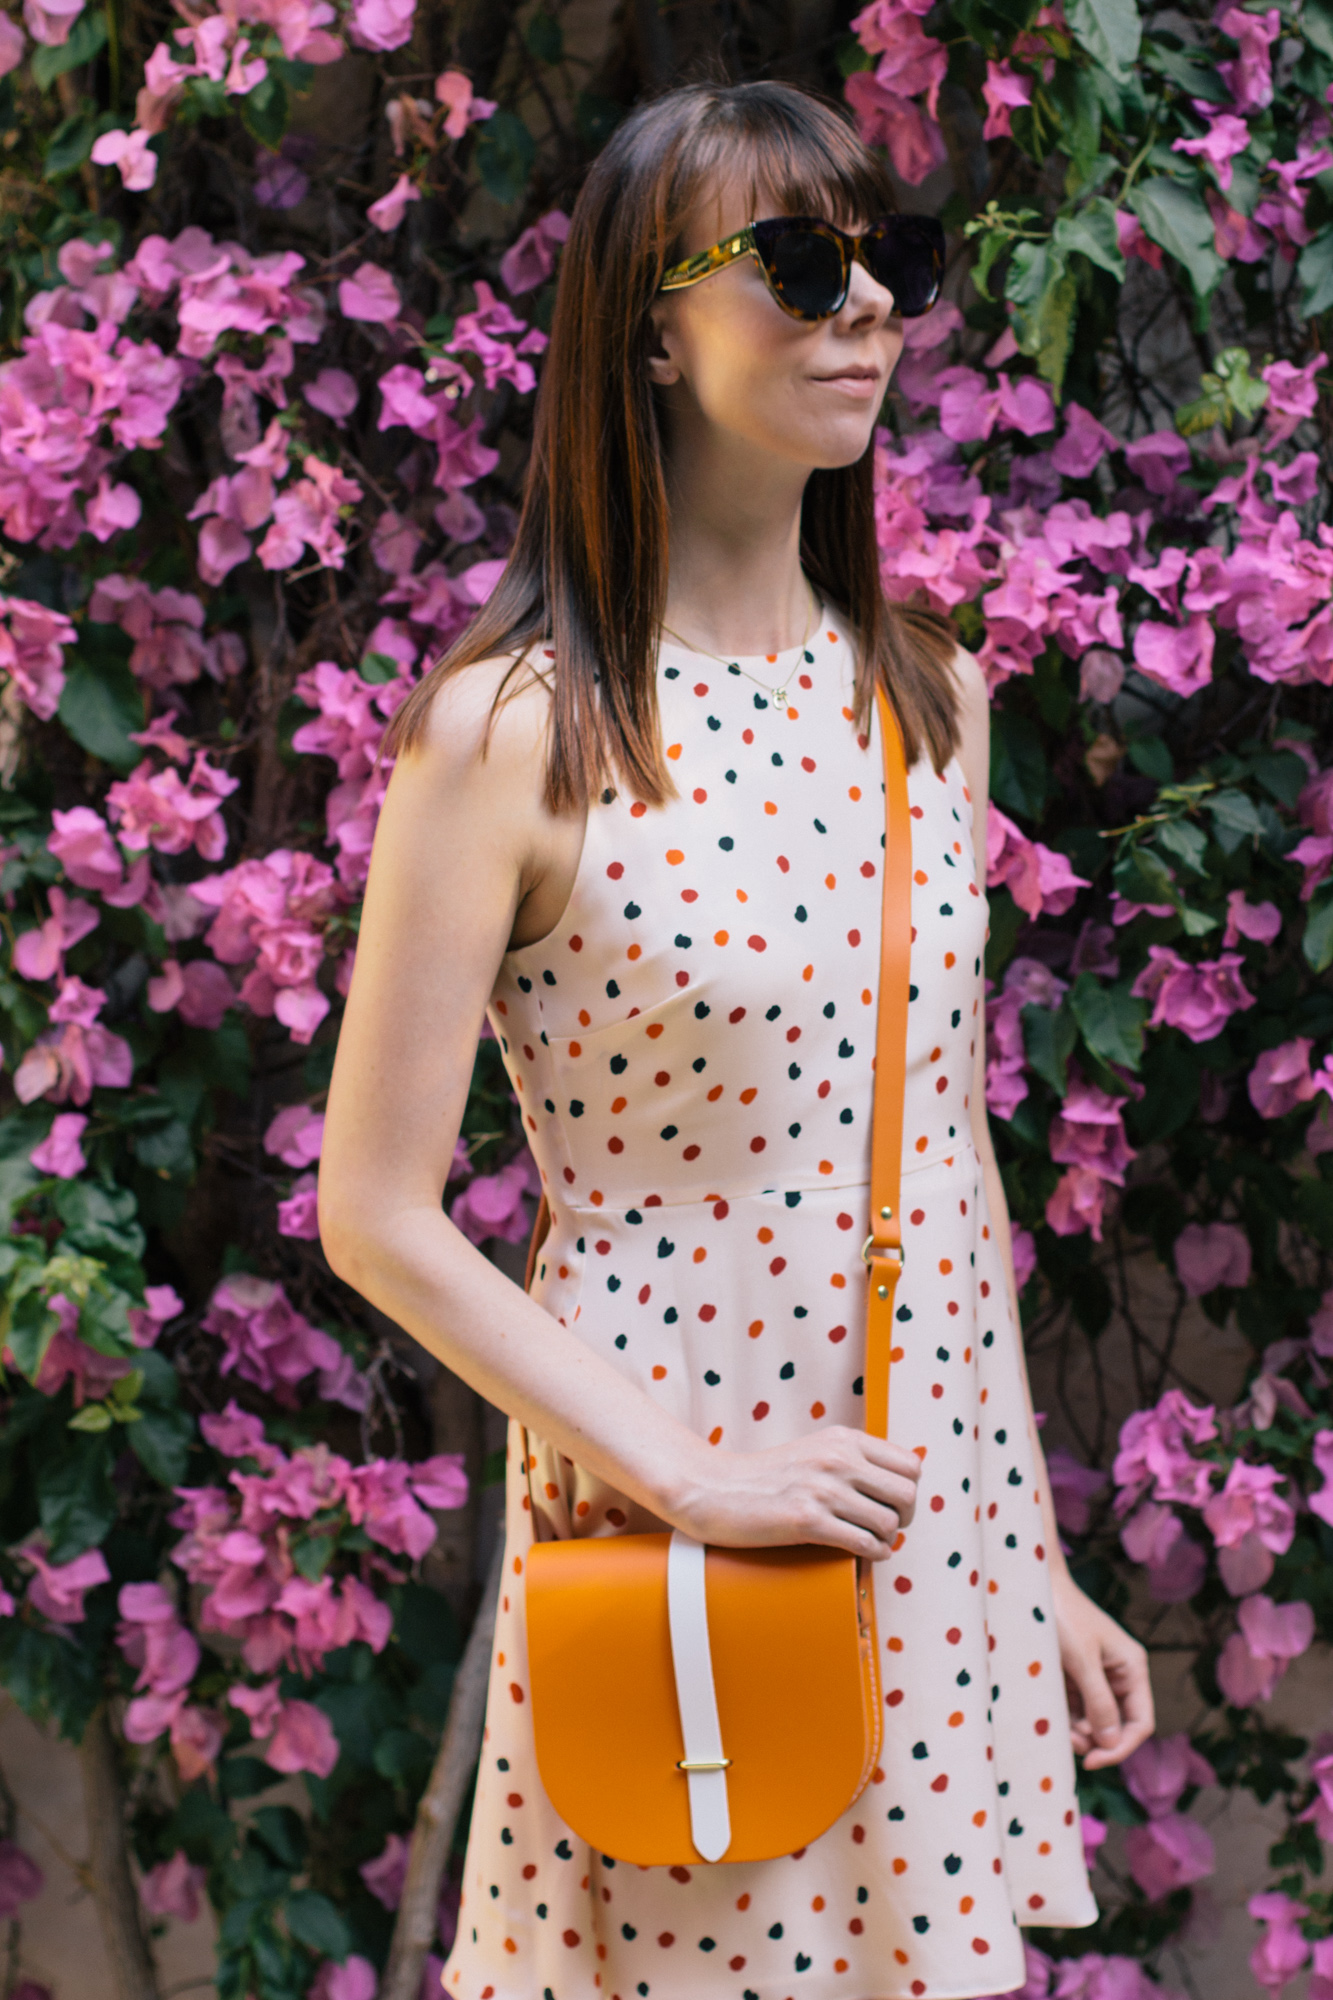 Wandering around Seville, Spain with a sunset orange saddle bag from the Cambridge Satchel Company   Sundays and Somedays